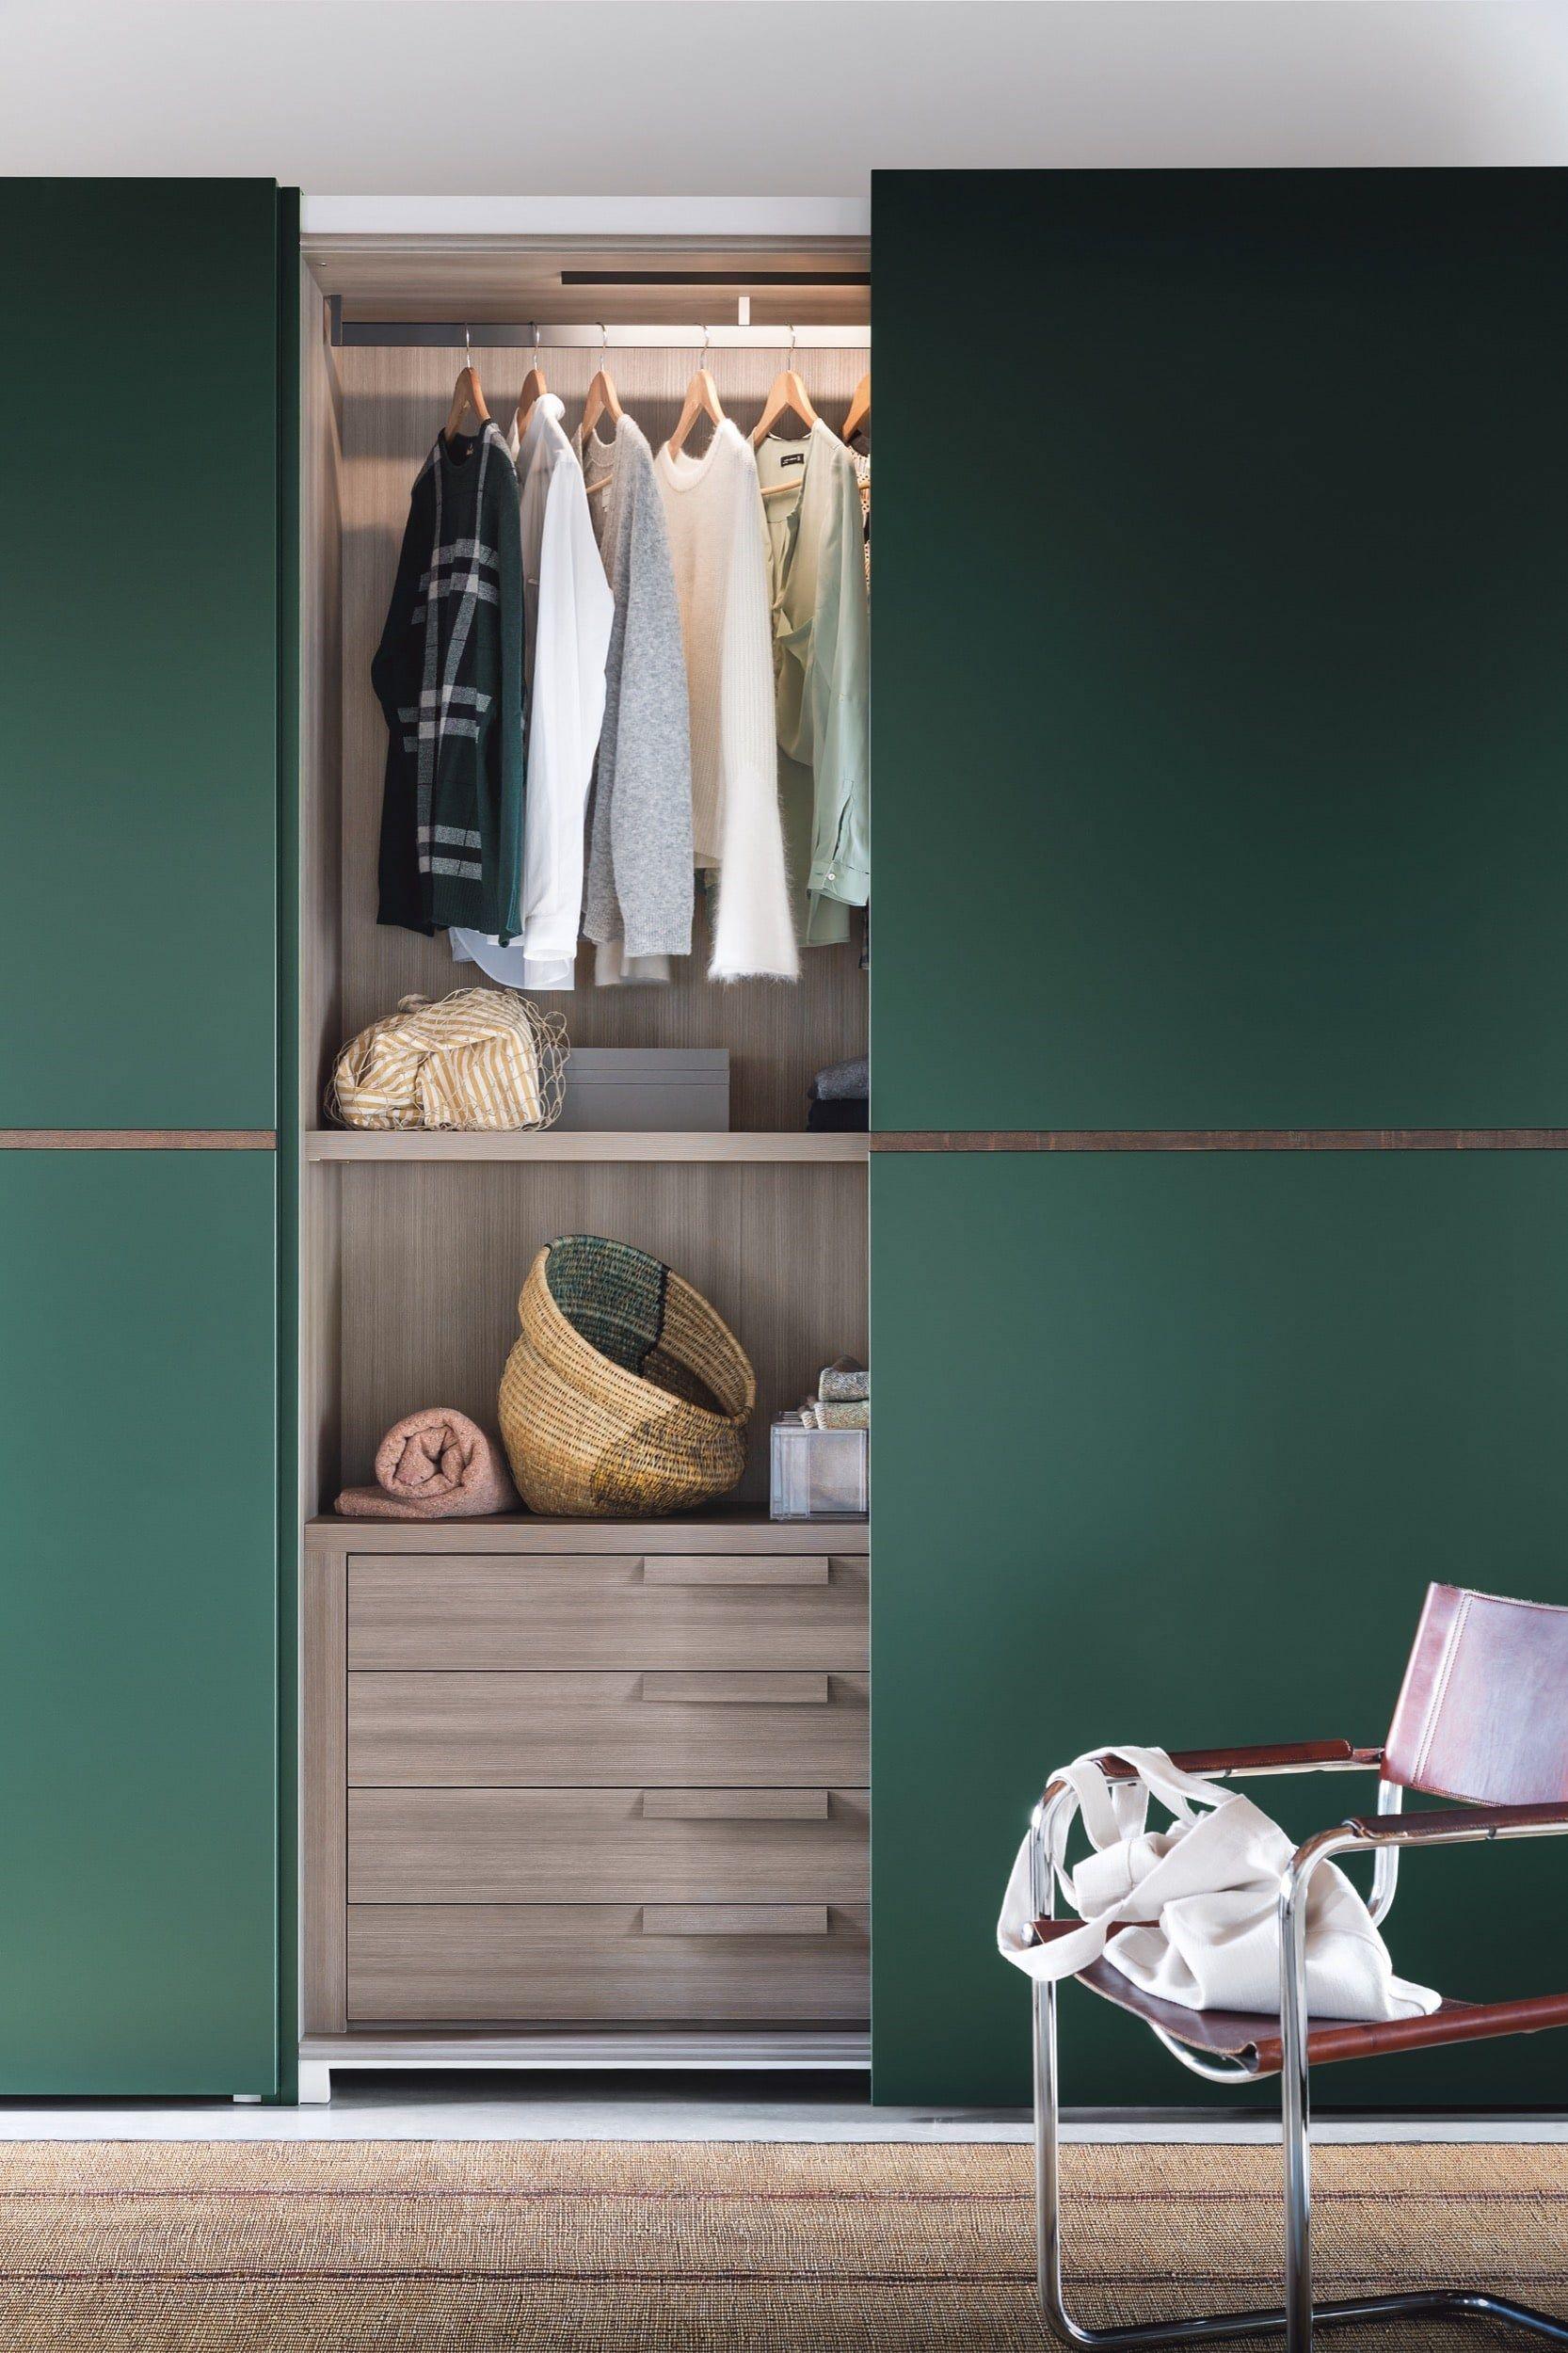 Middle Wardrobe With Coplanar Doors By Novamobili Victorian Terrace Interior Bedroom Decor Decor